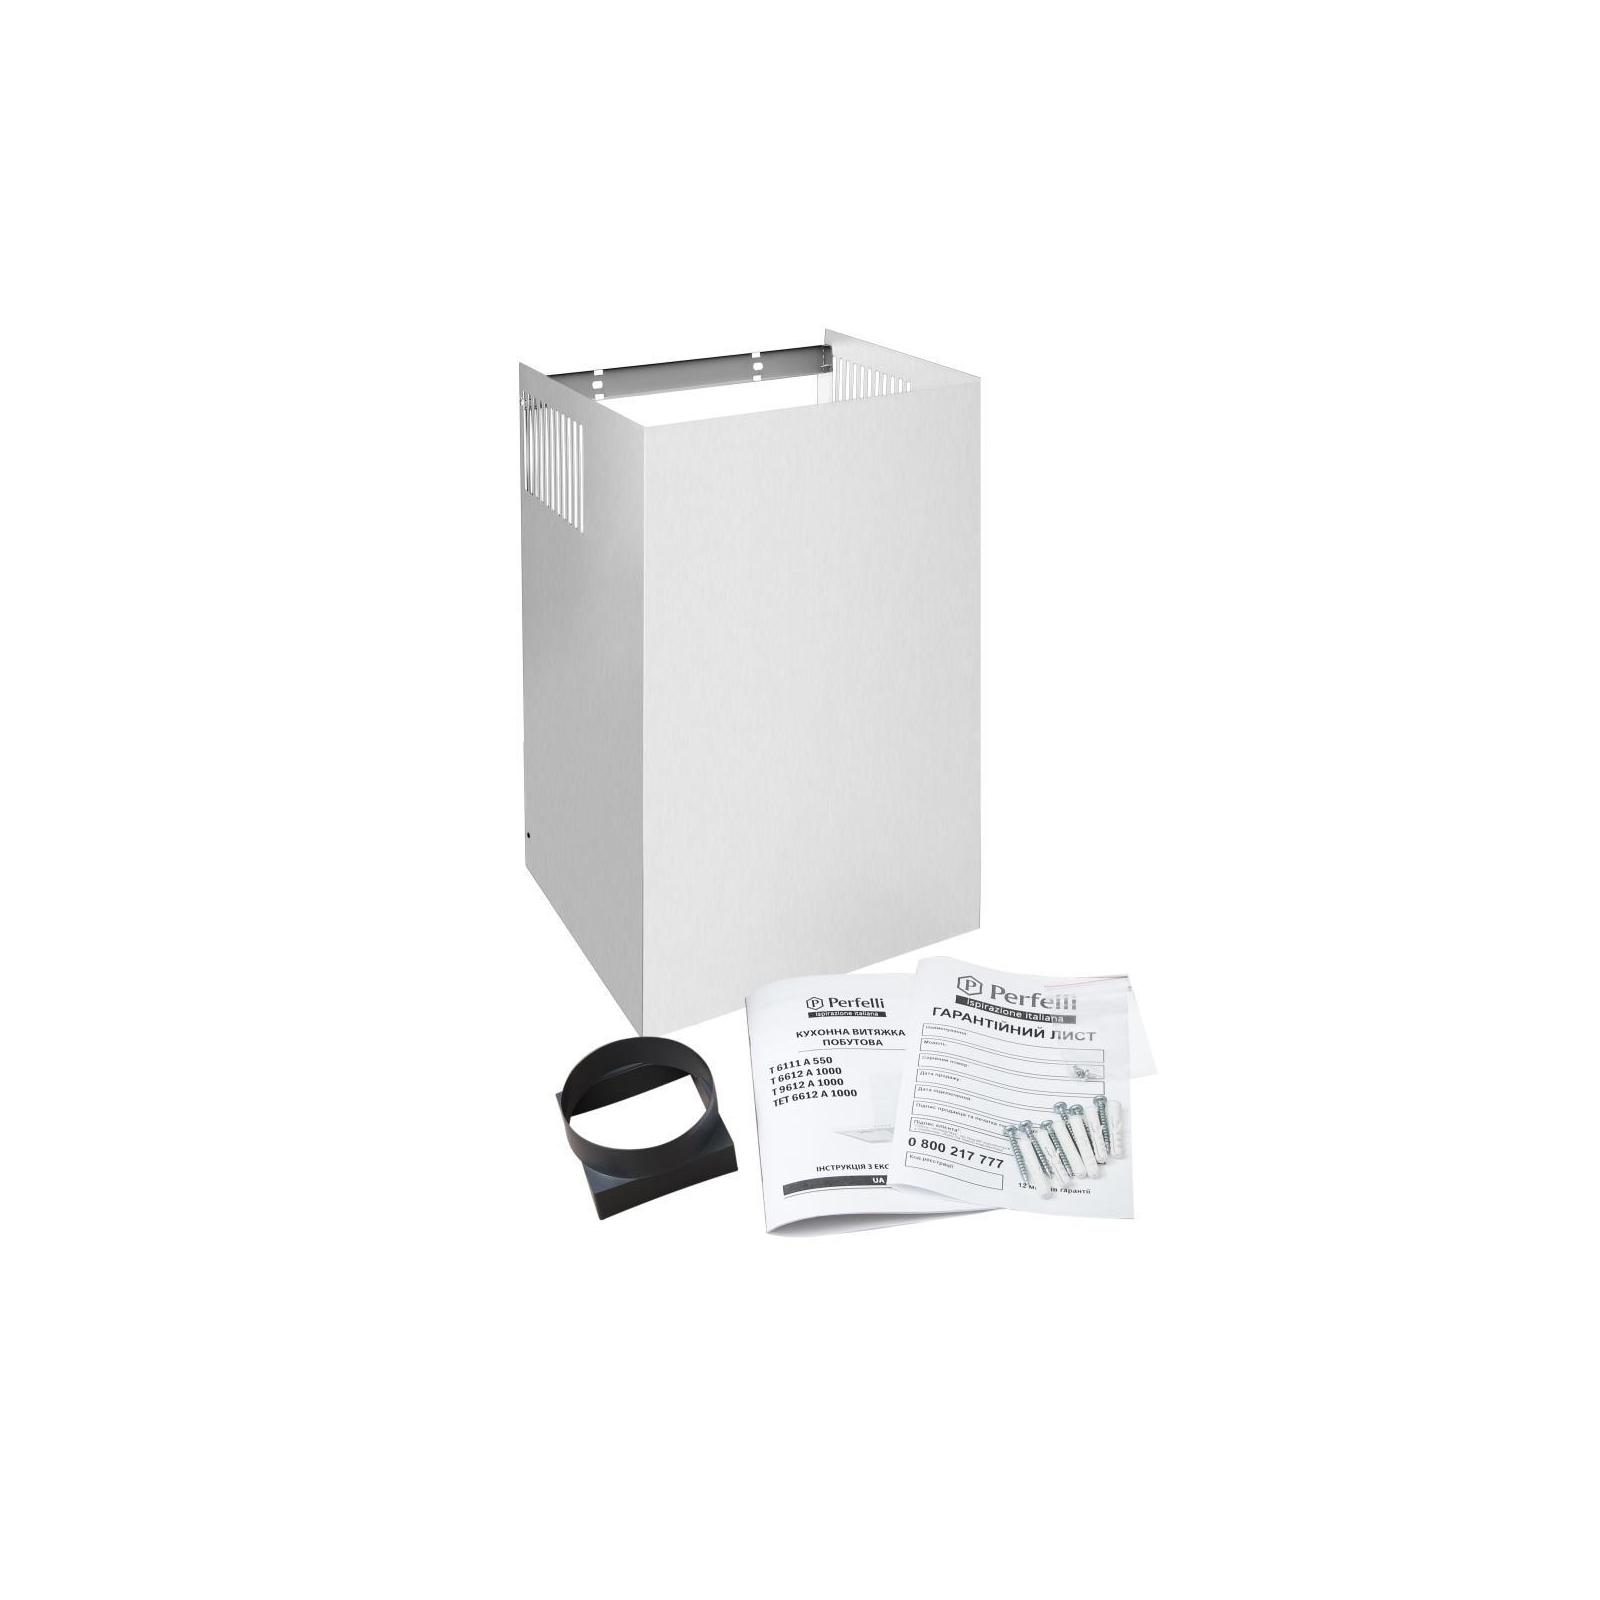 Вытяжка кухонная PERFELLI TET 6612 A 1000 I LED изображение 9